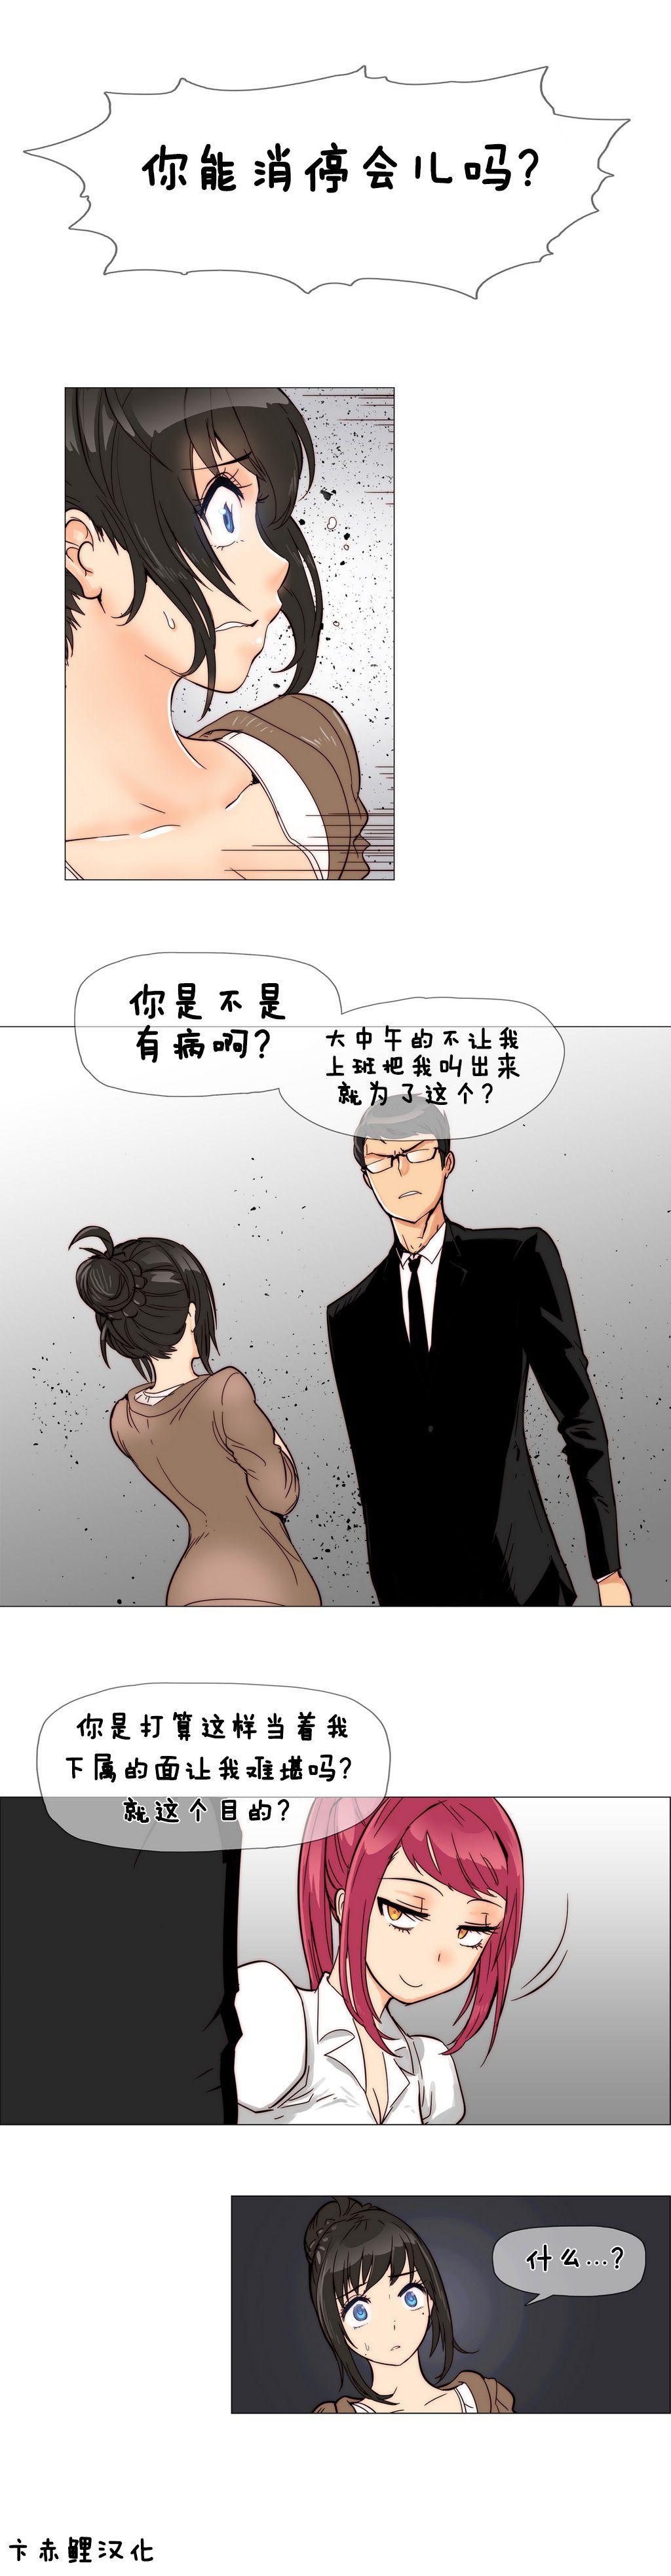 HouseHold Affairs 【卞赤鲤个人汉化】1~33话(持续更新中) 96